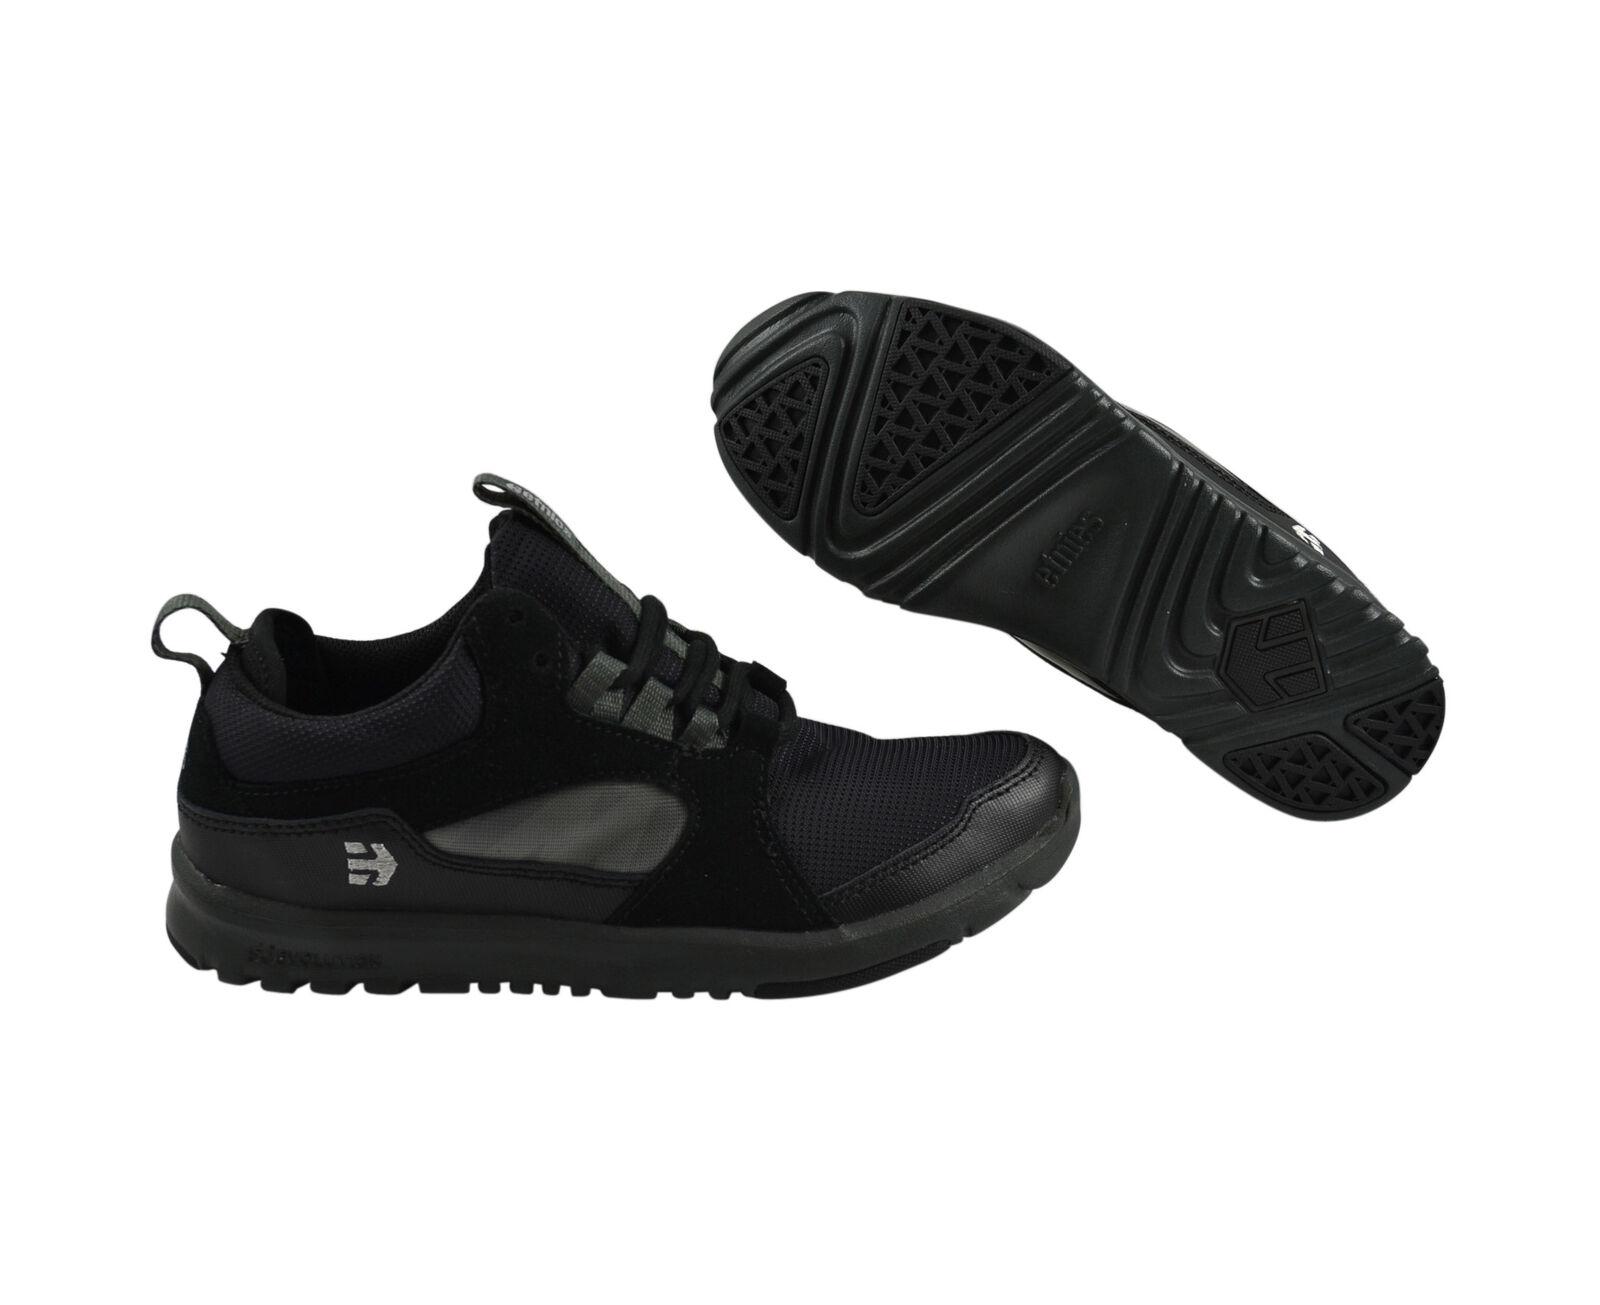 buy popular ad159 6dee3 Etnies Scout grau MT schwarz dark grau Scout Skater Turnschuhe Schuhe  schwarz e0e450